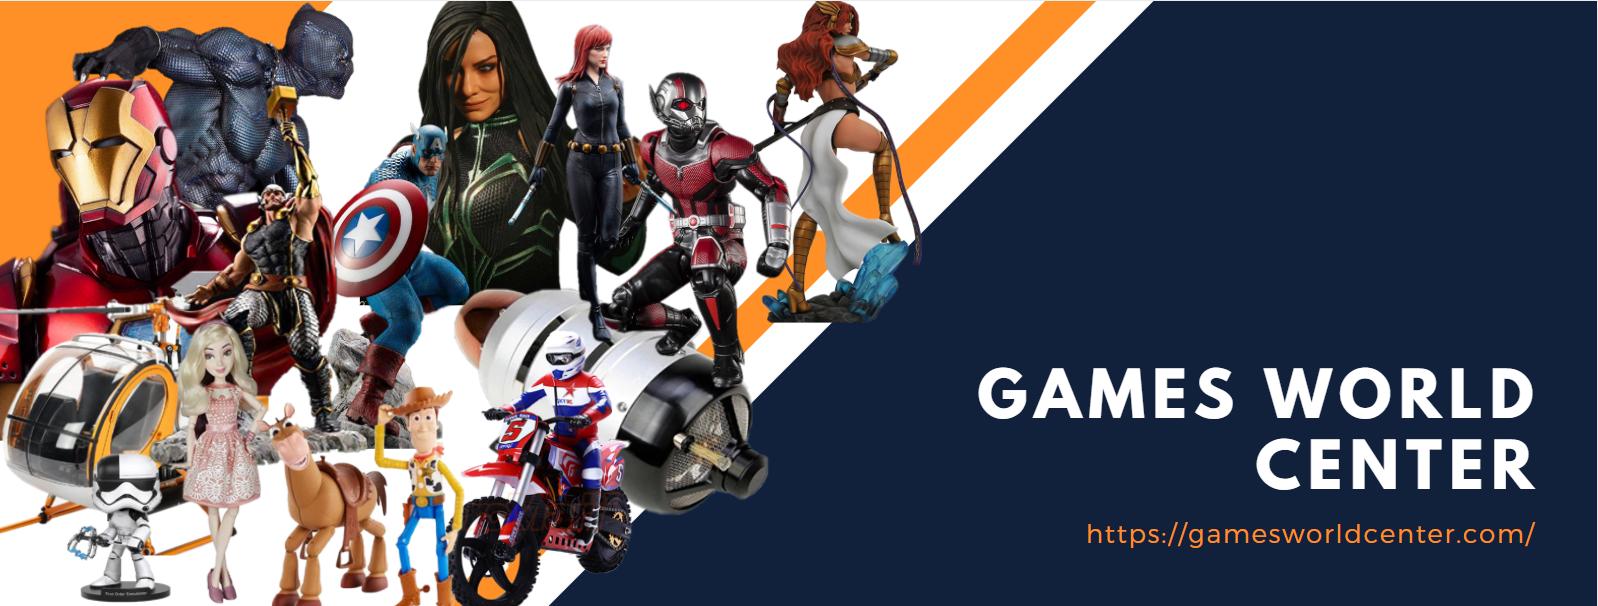 Games World Center Cover